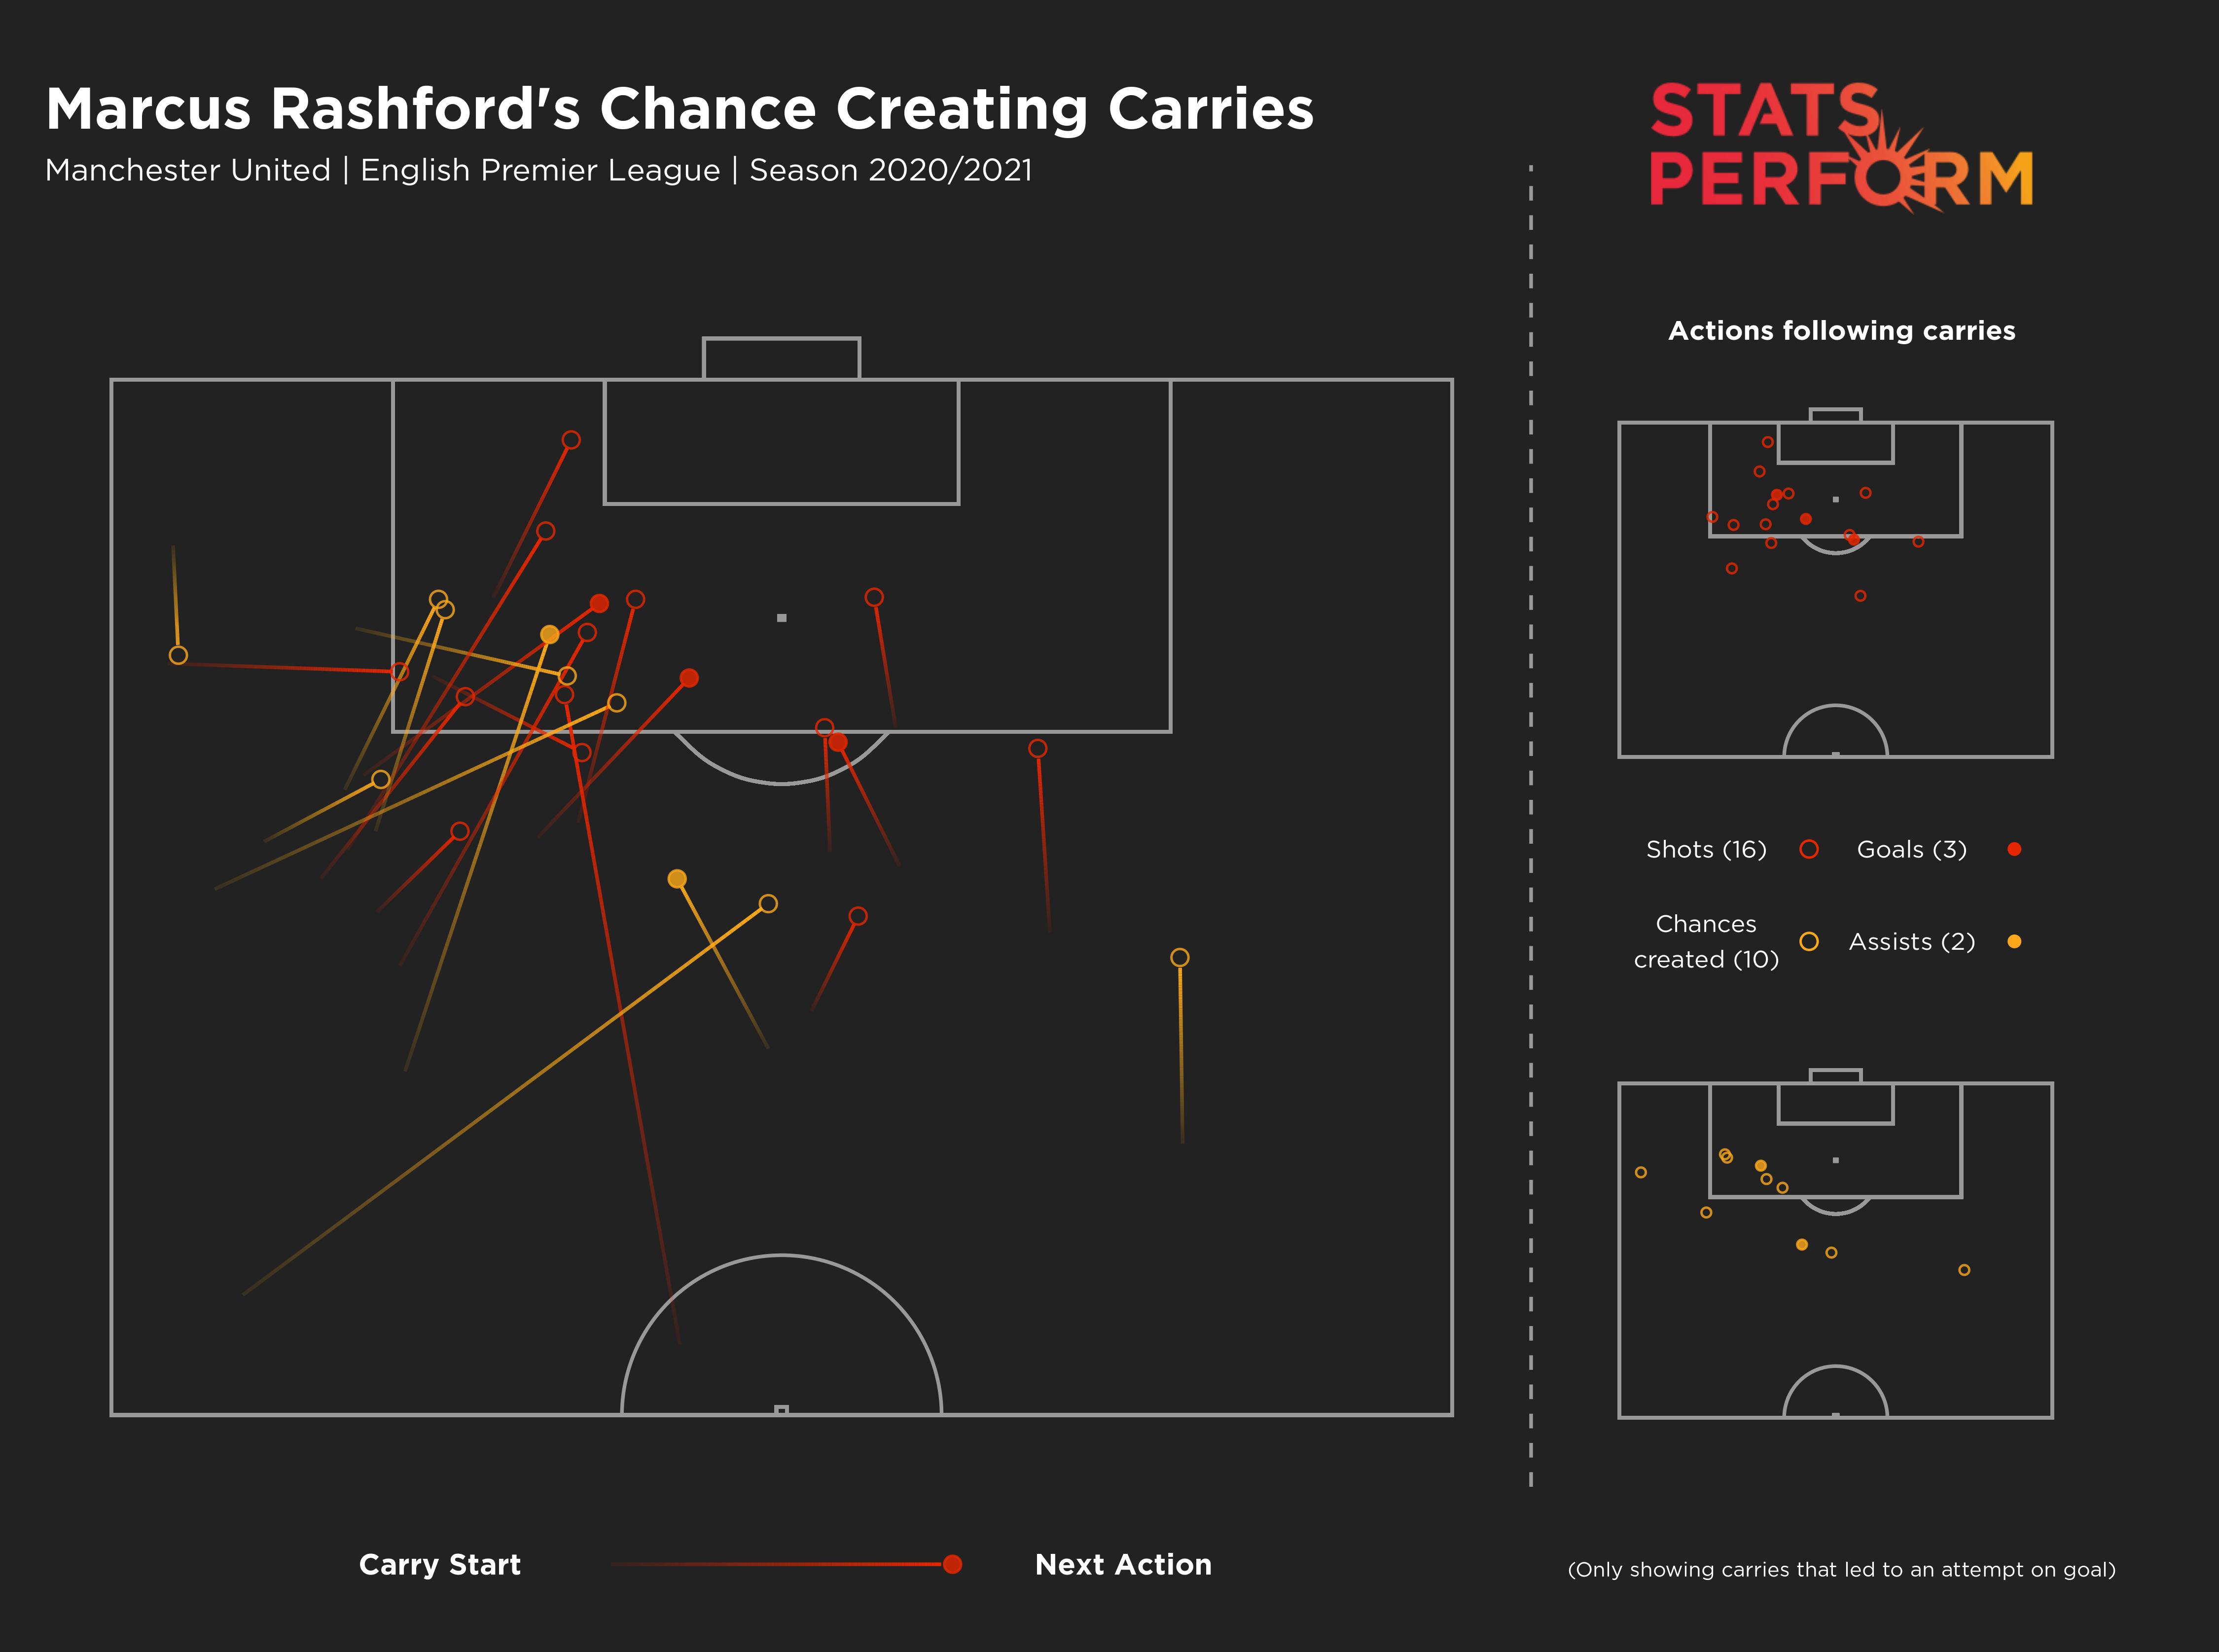 Rashford chance creation carries